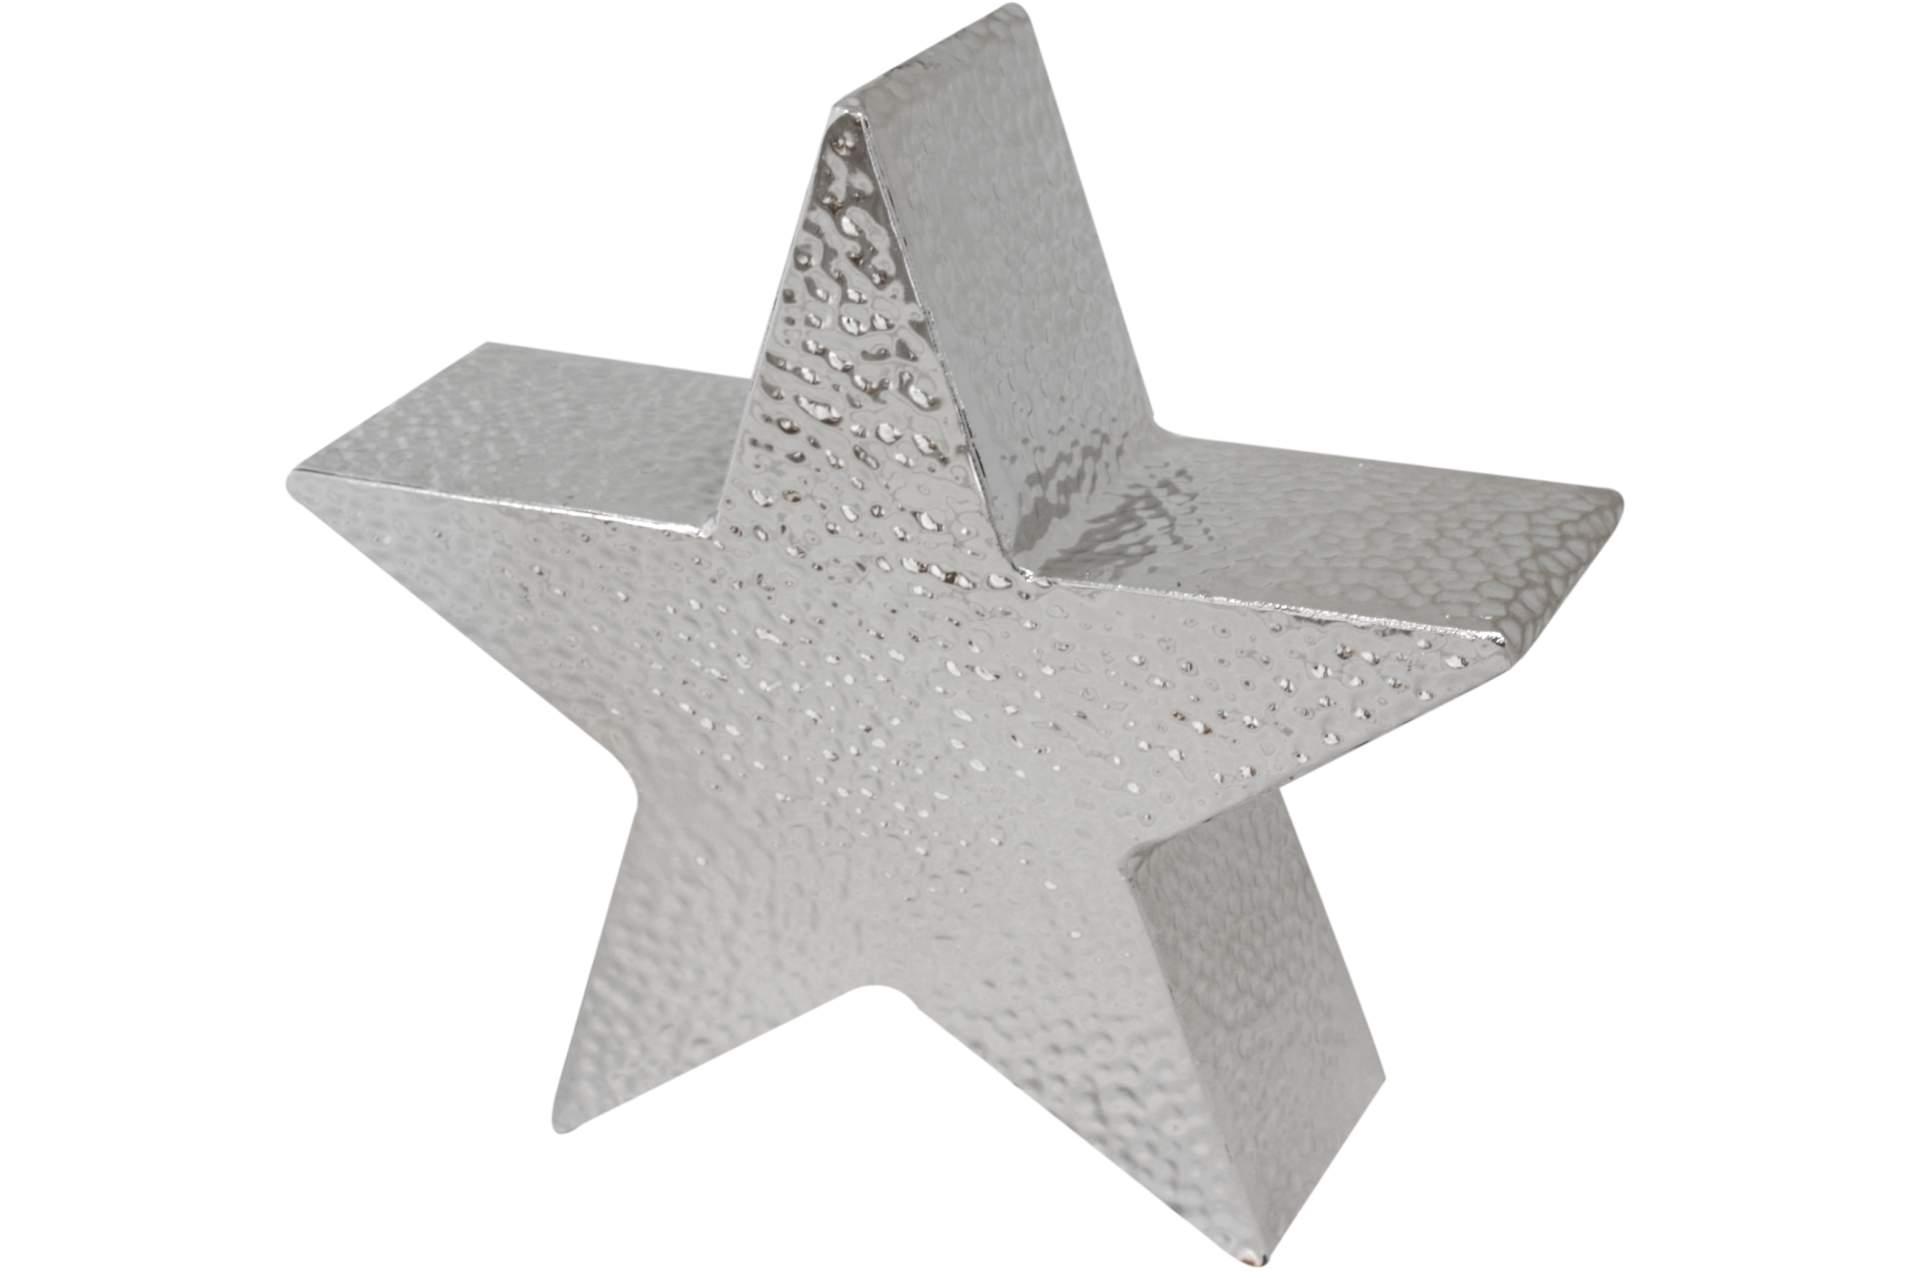 deko metallstern geh mmert silber 26 cm weihnachten stern holz advent winter neu ebay. Black Bedroom Furniture Sets. Home Design Ideas